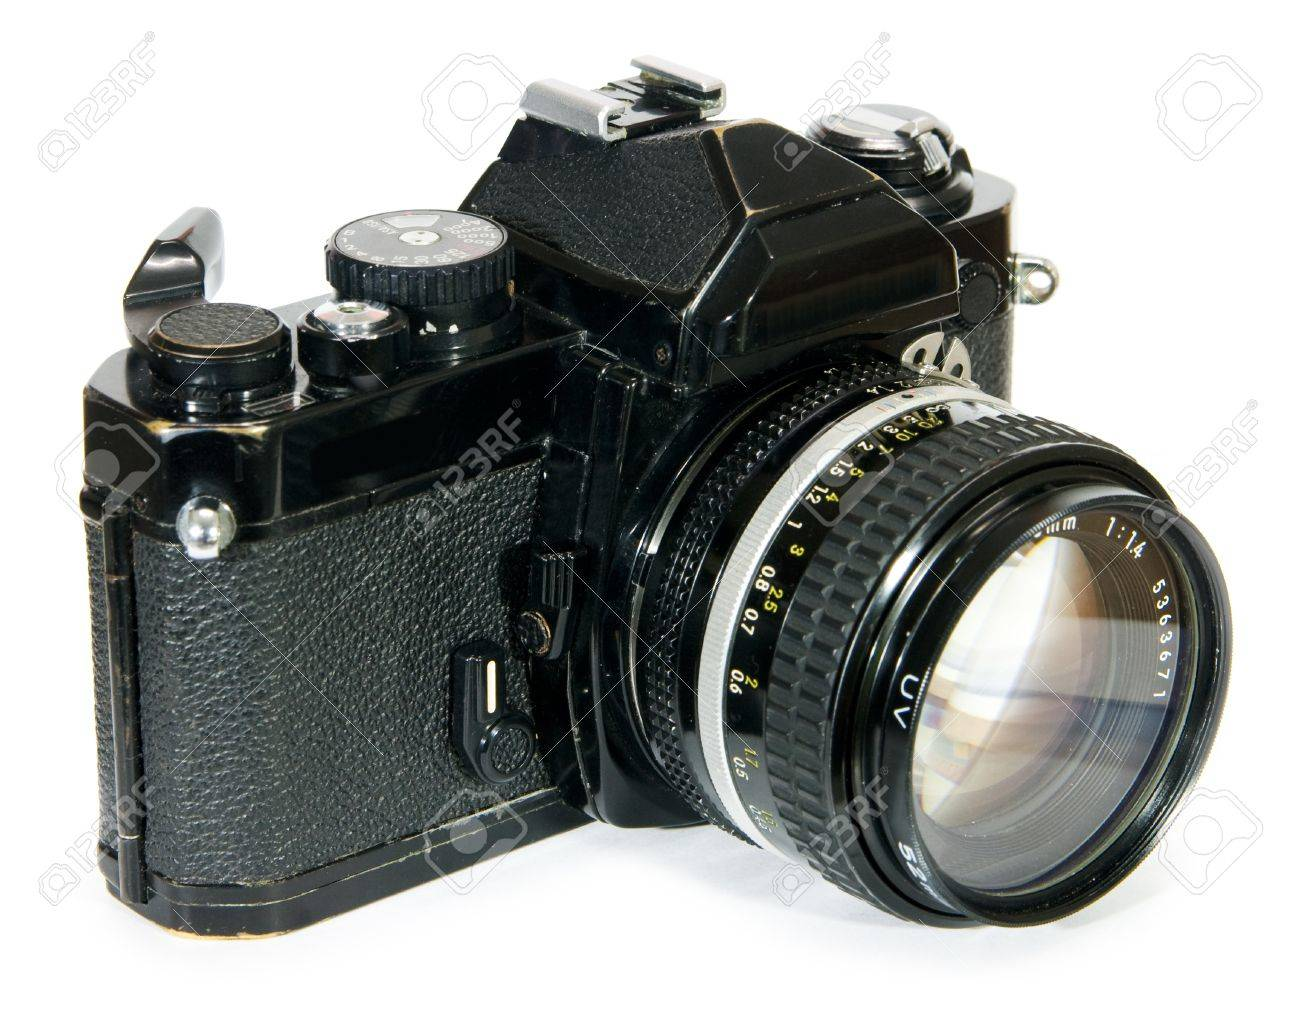 old and classic vintage 35mm manual focus film slr camera stock rh 123rf com minolta manual focus slr cameras 35mm slr manual focus camera